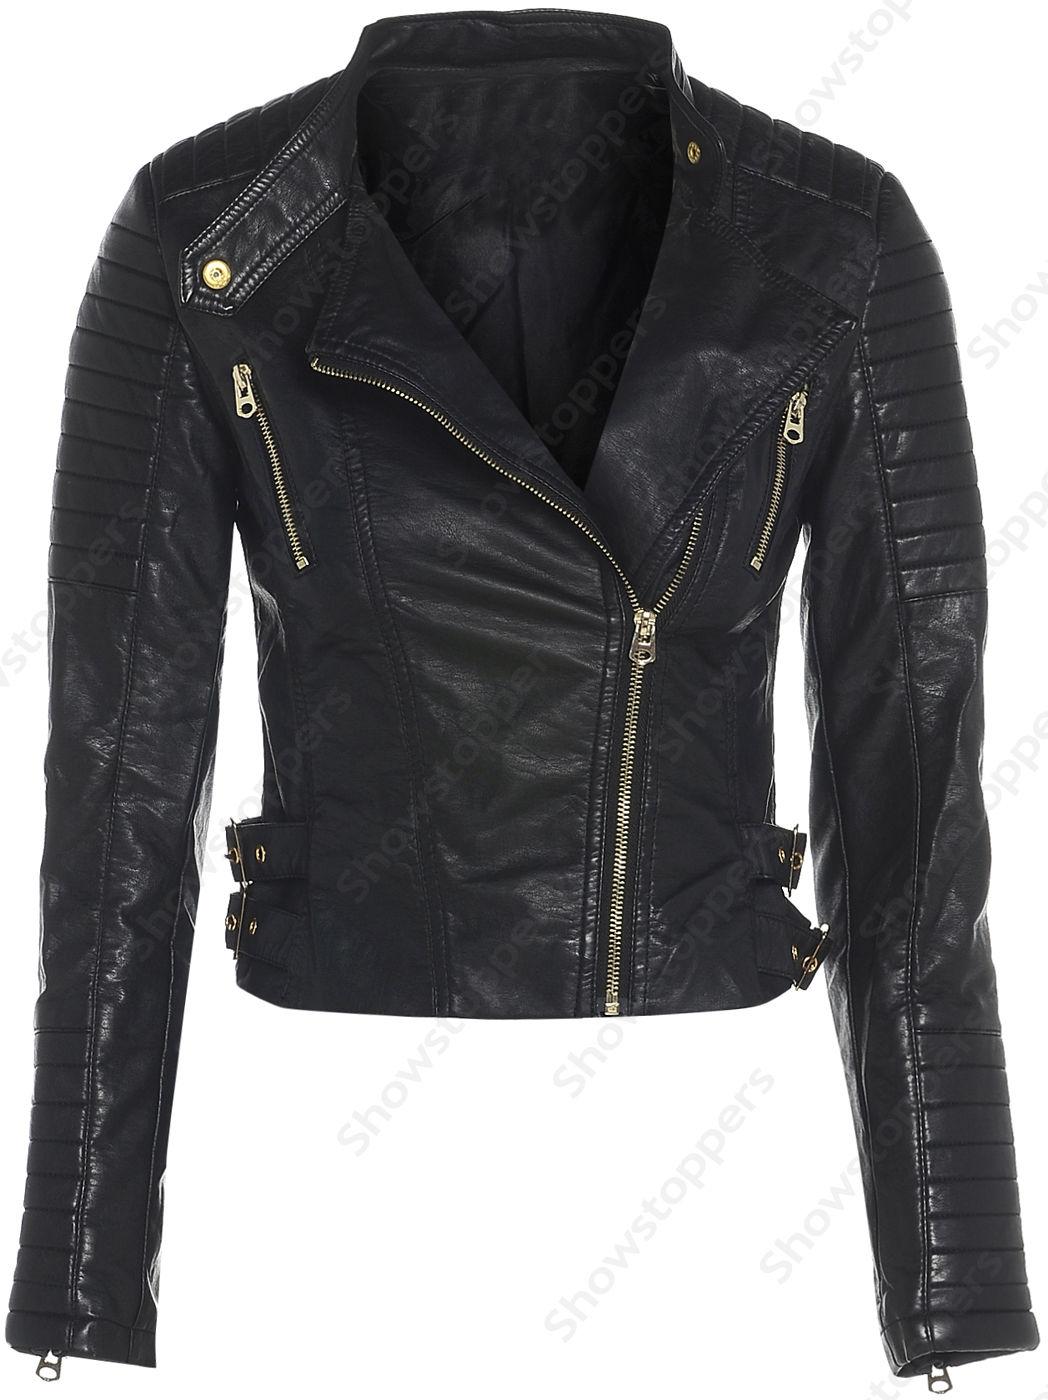 Size 8 10 12 14 16 NEW Womens BIKER JACKET Crop FAUX LEATHER Ladies ZIP Coat | eBay